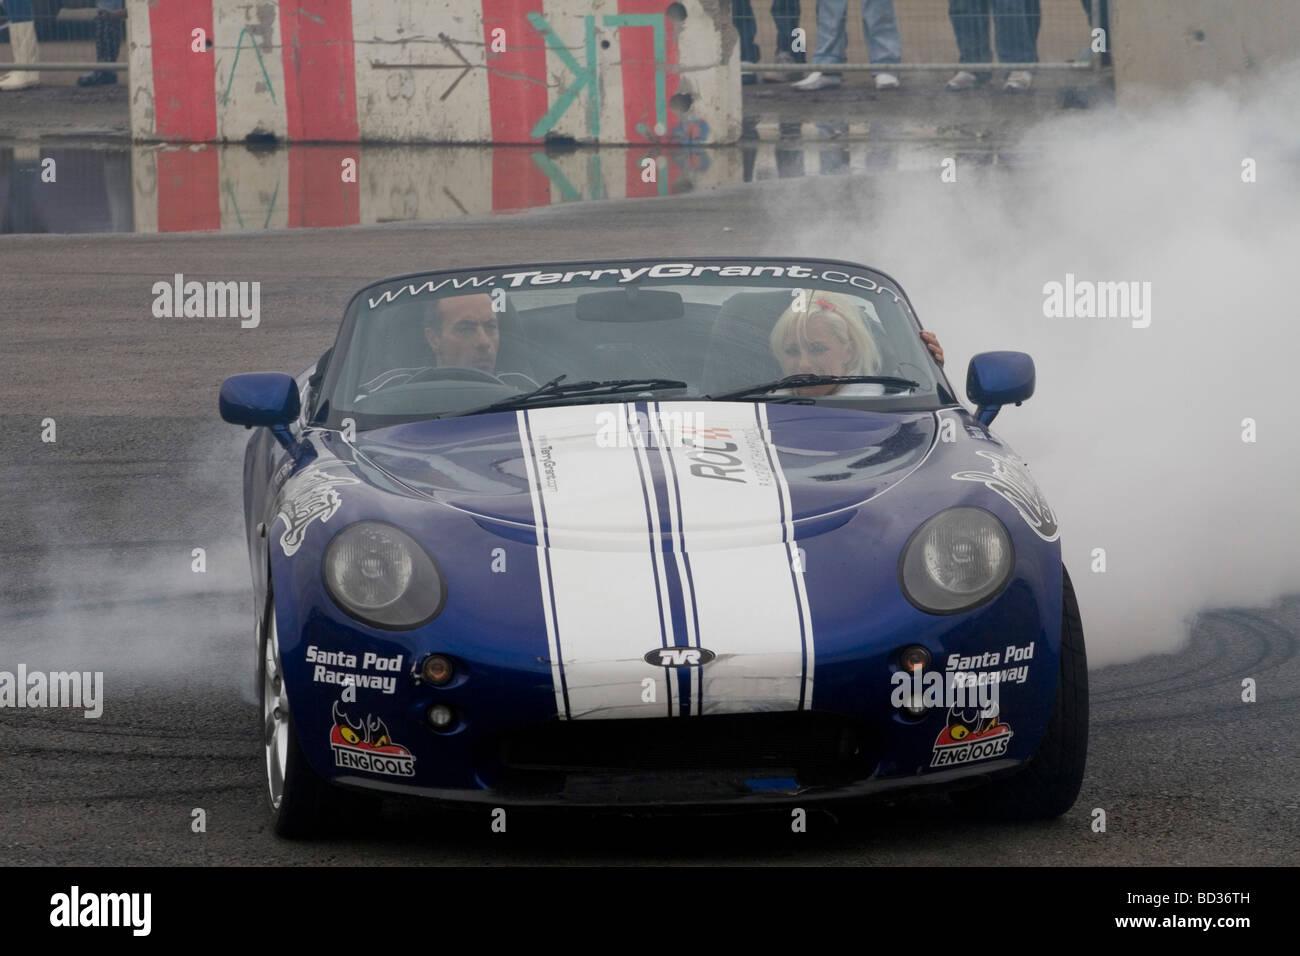 A stunt driver performing a stunt at Santa Pod Raceway - Stock Image